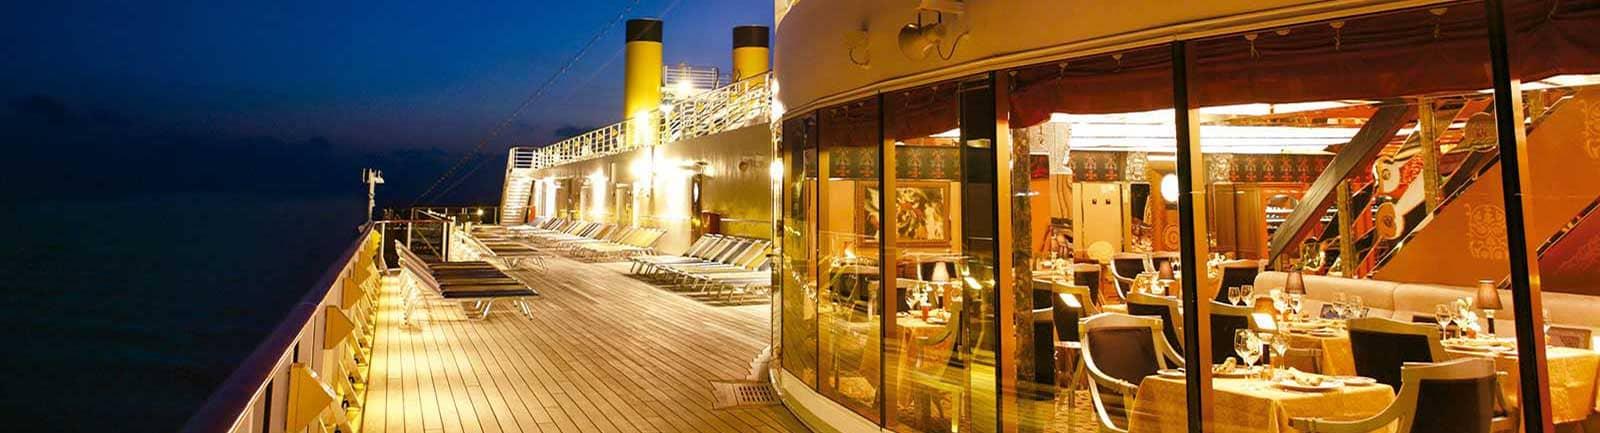 Costa Cruceros Cubierta noche